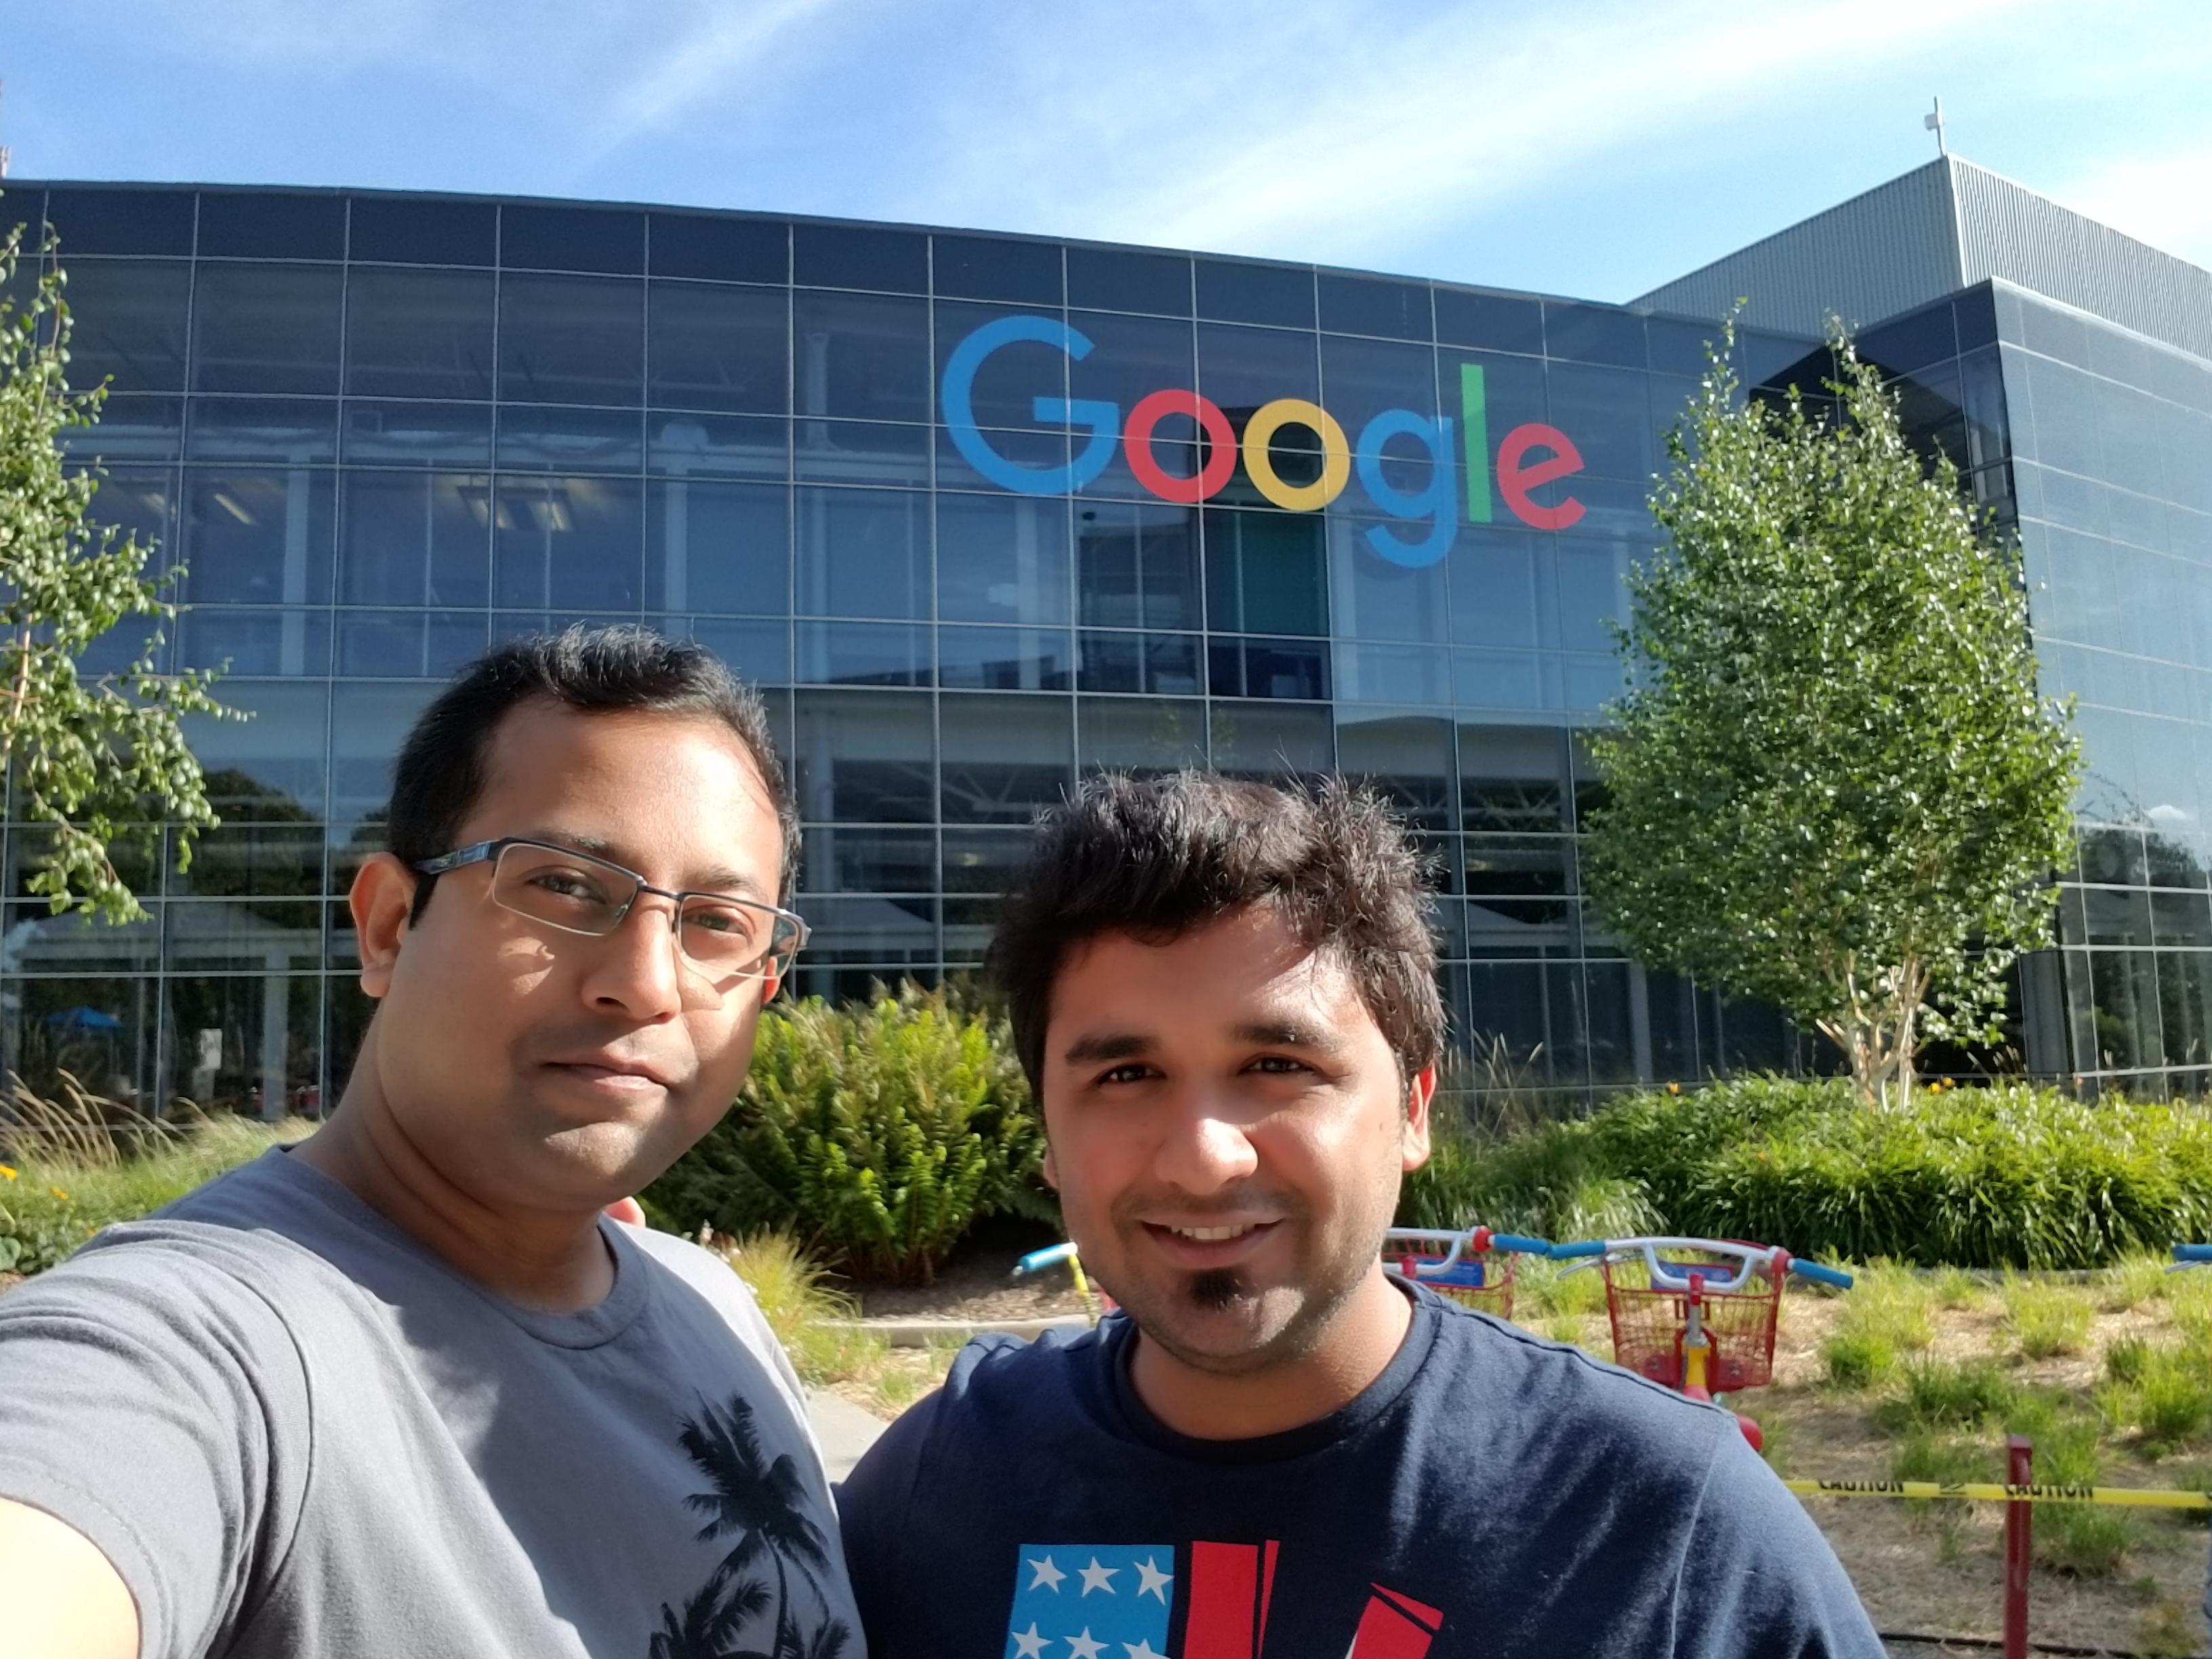 Sayantan Acharjee (MBA '19), Google Intern, and Anand Tamhankar (MBA '19)